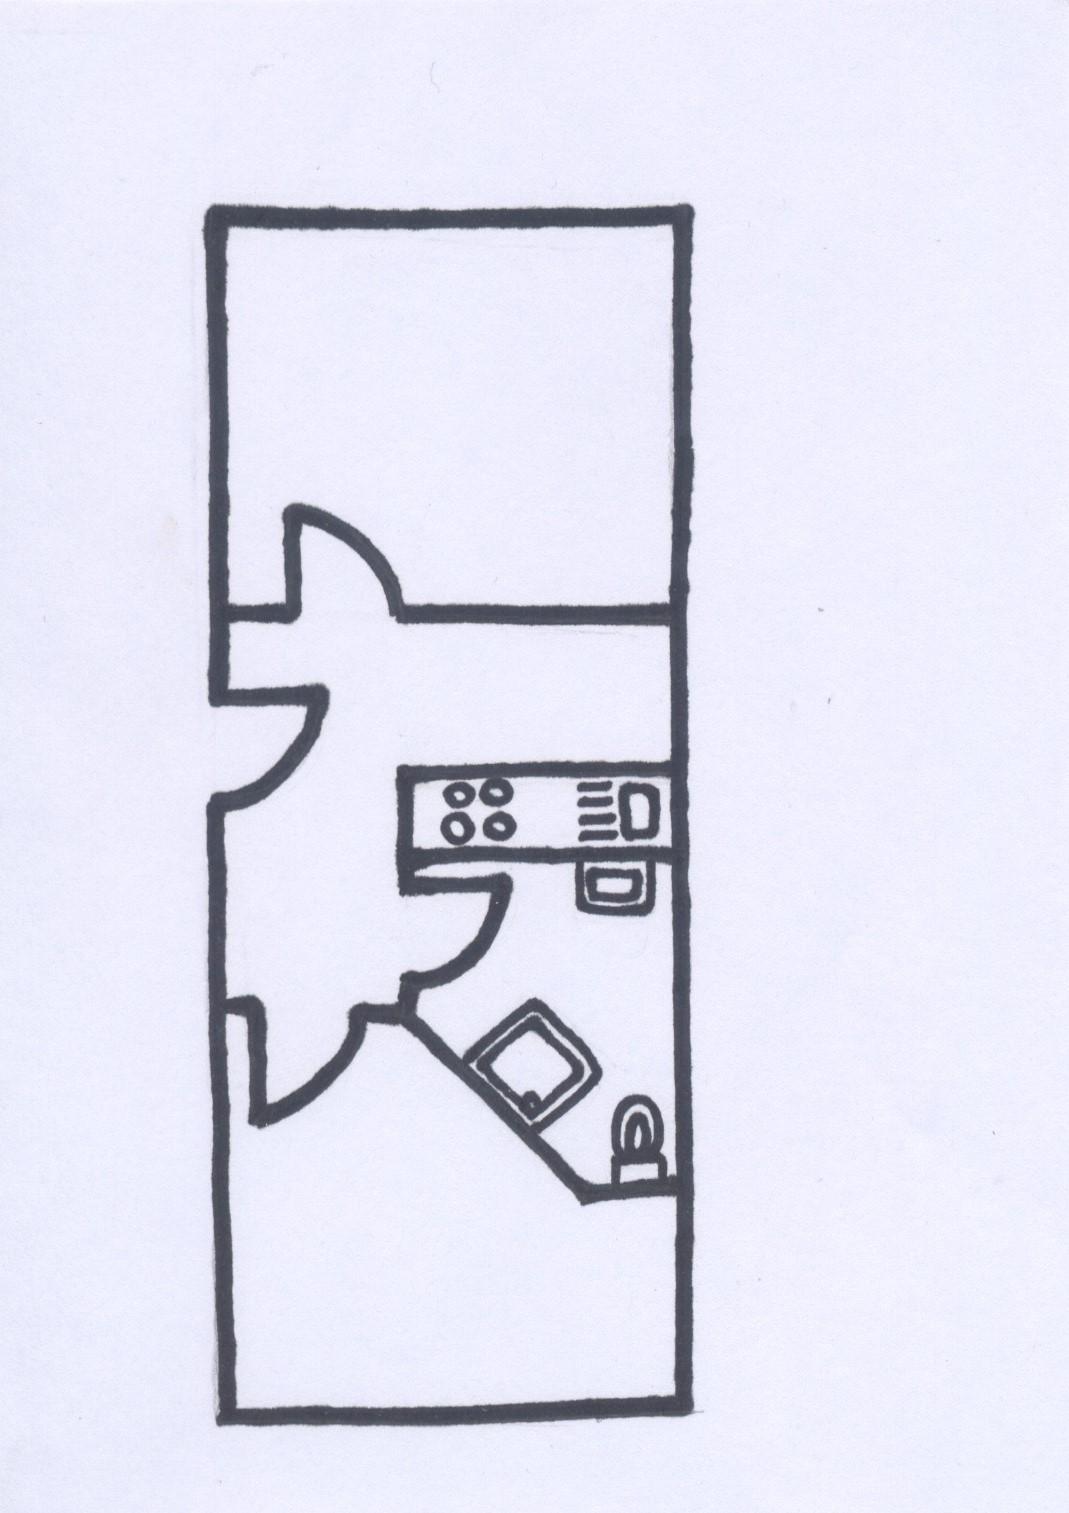 W22-3